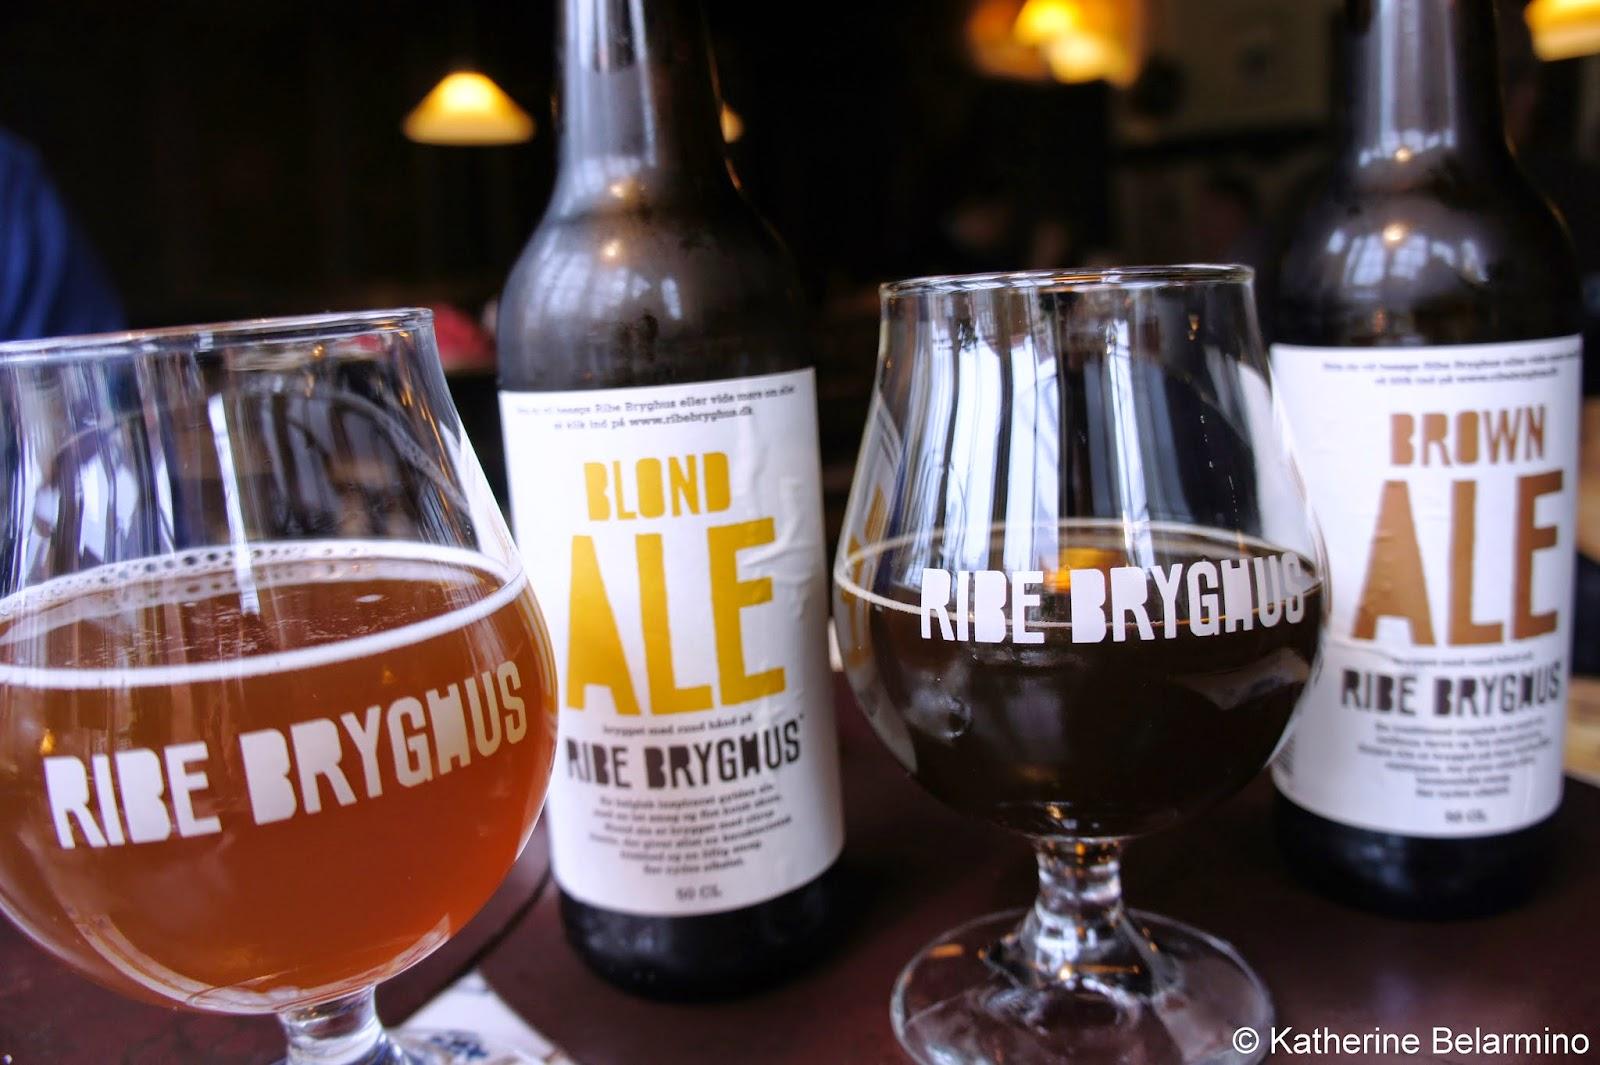 Ribe Bryghus Danish Beer Ribe Denmark